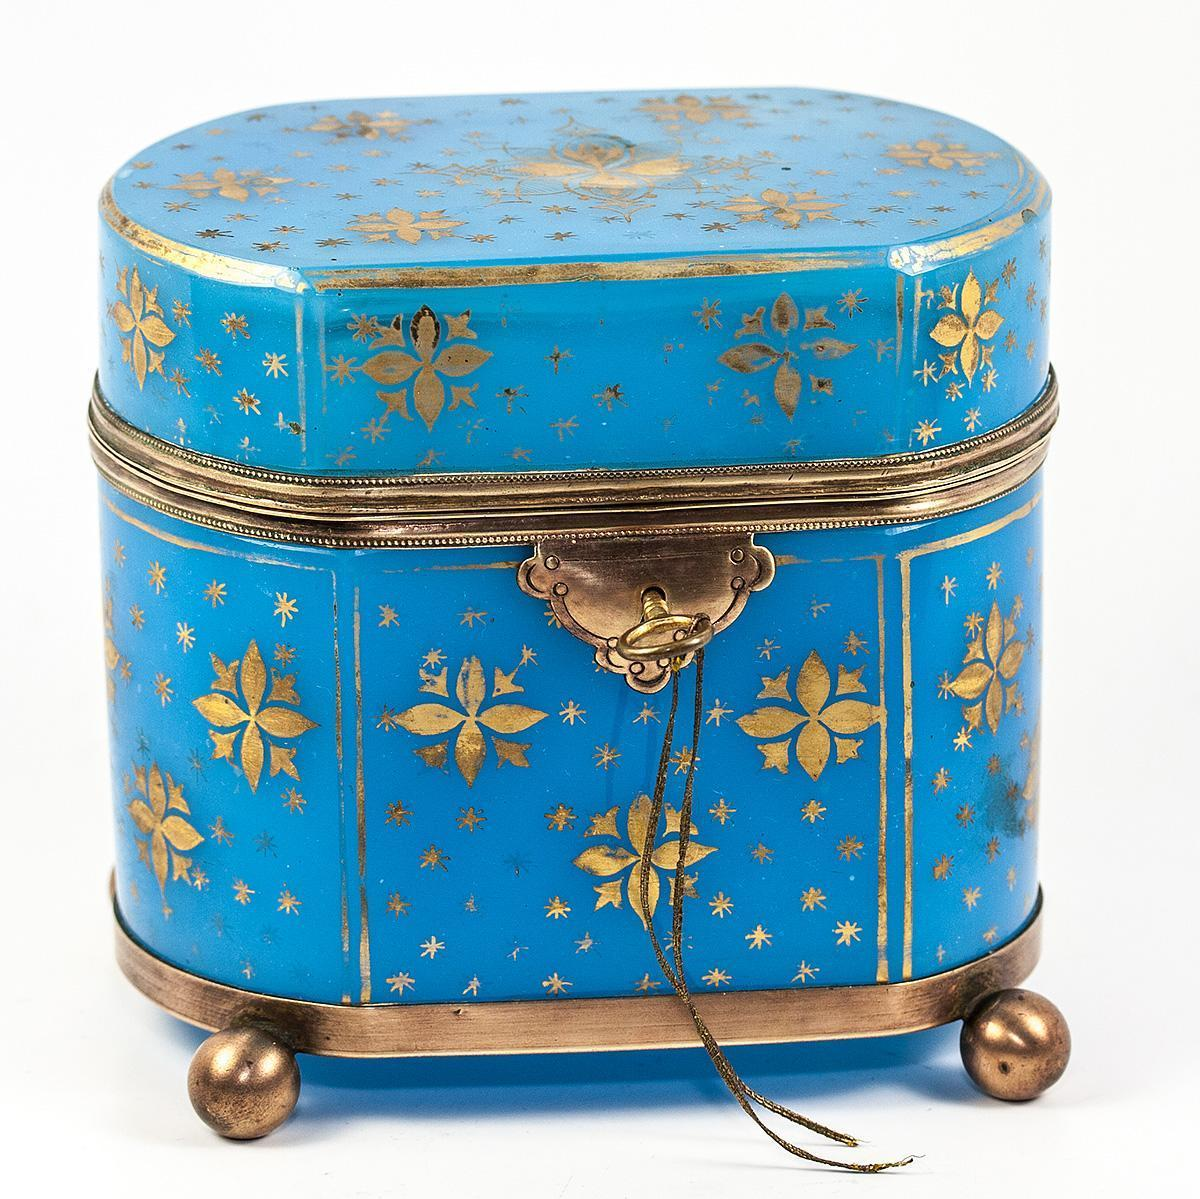 Antique French Opaline Sugar Casket, Jewelry Box, Working Lock with Key, Gold Enamel on Blue